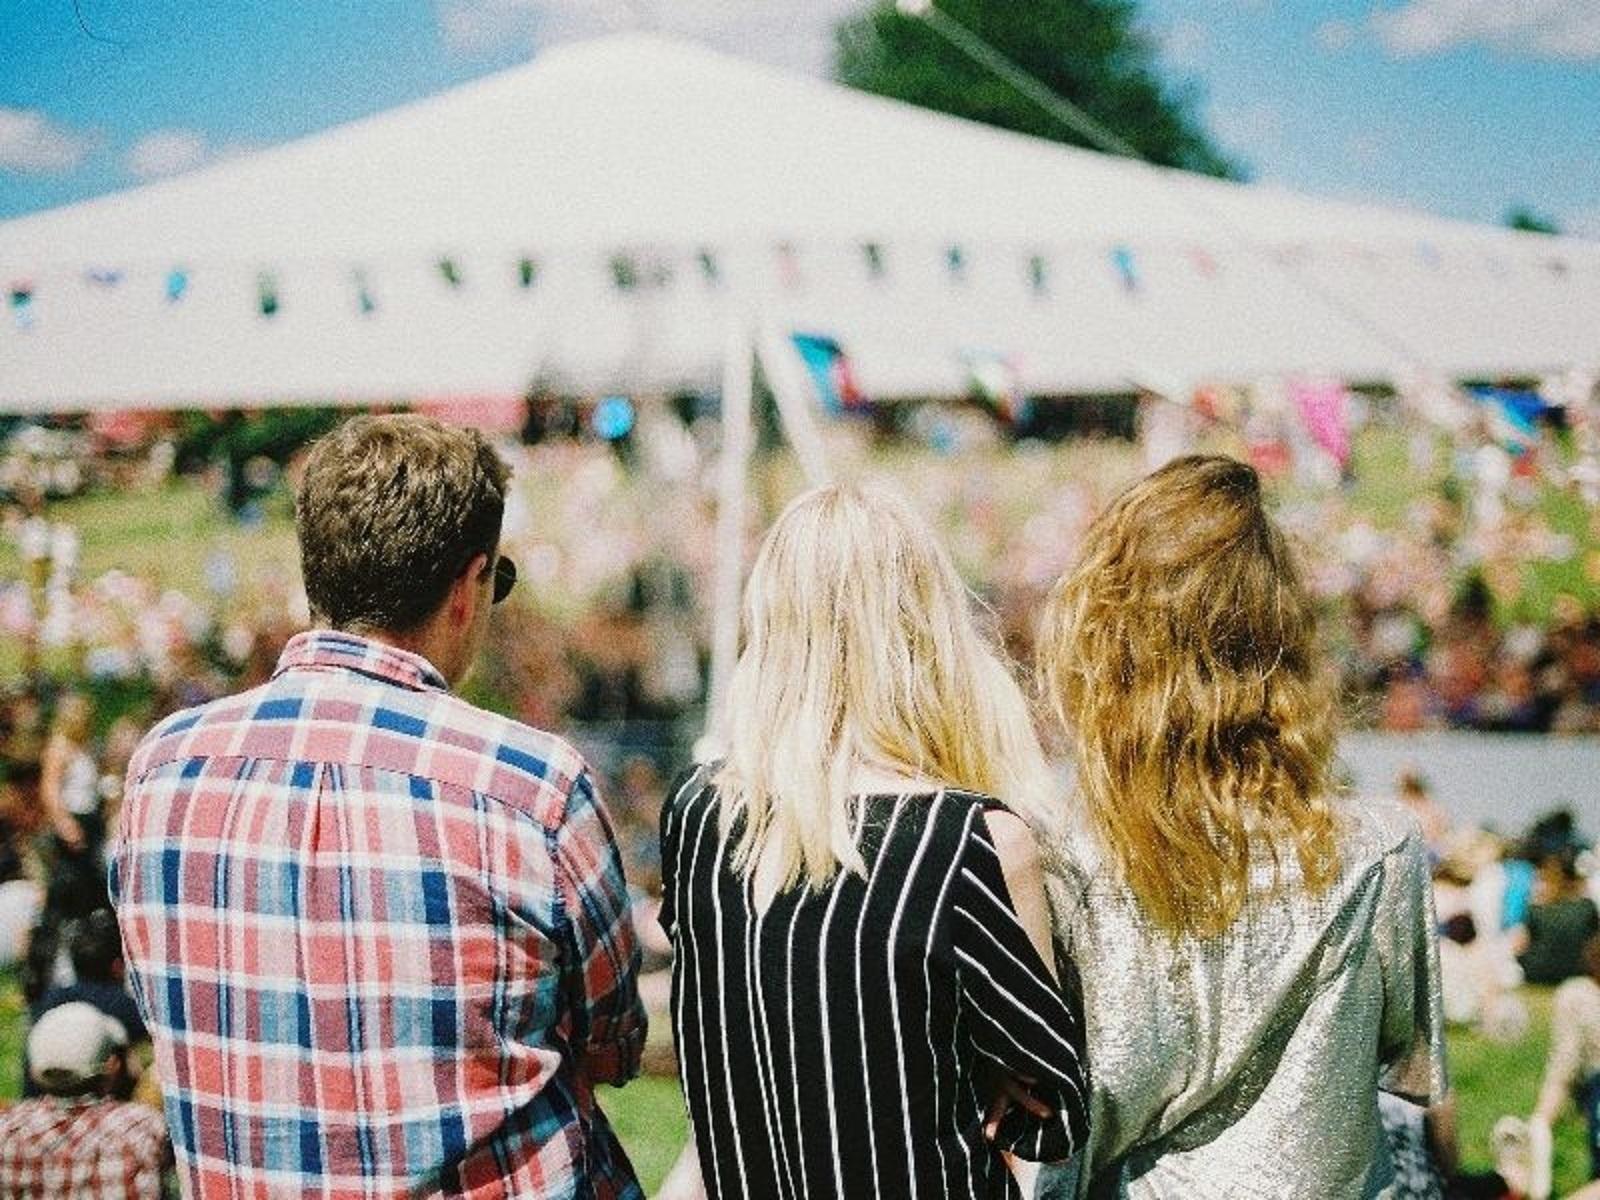 festivaltrend